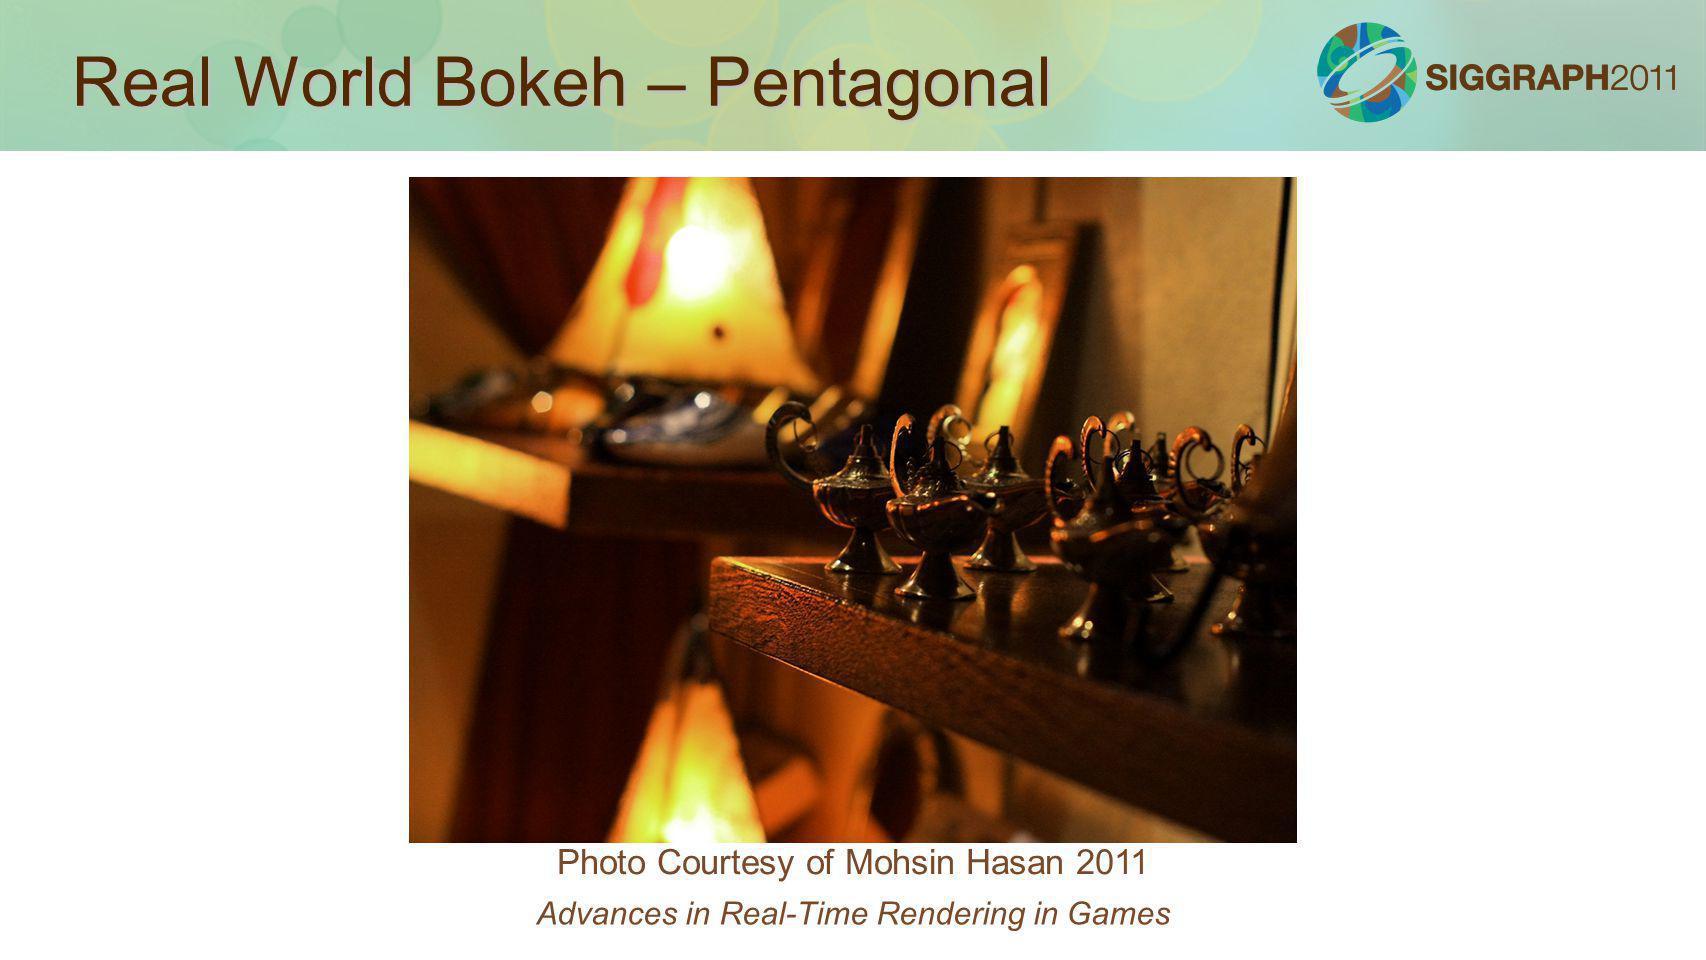 Real World Bokeh – Pentagonal